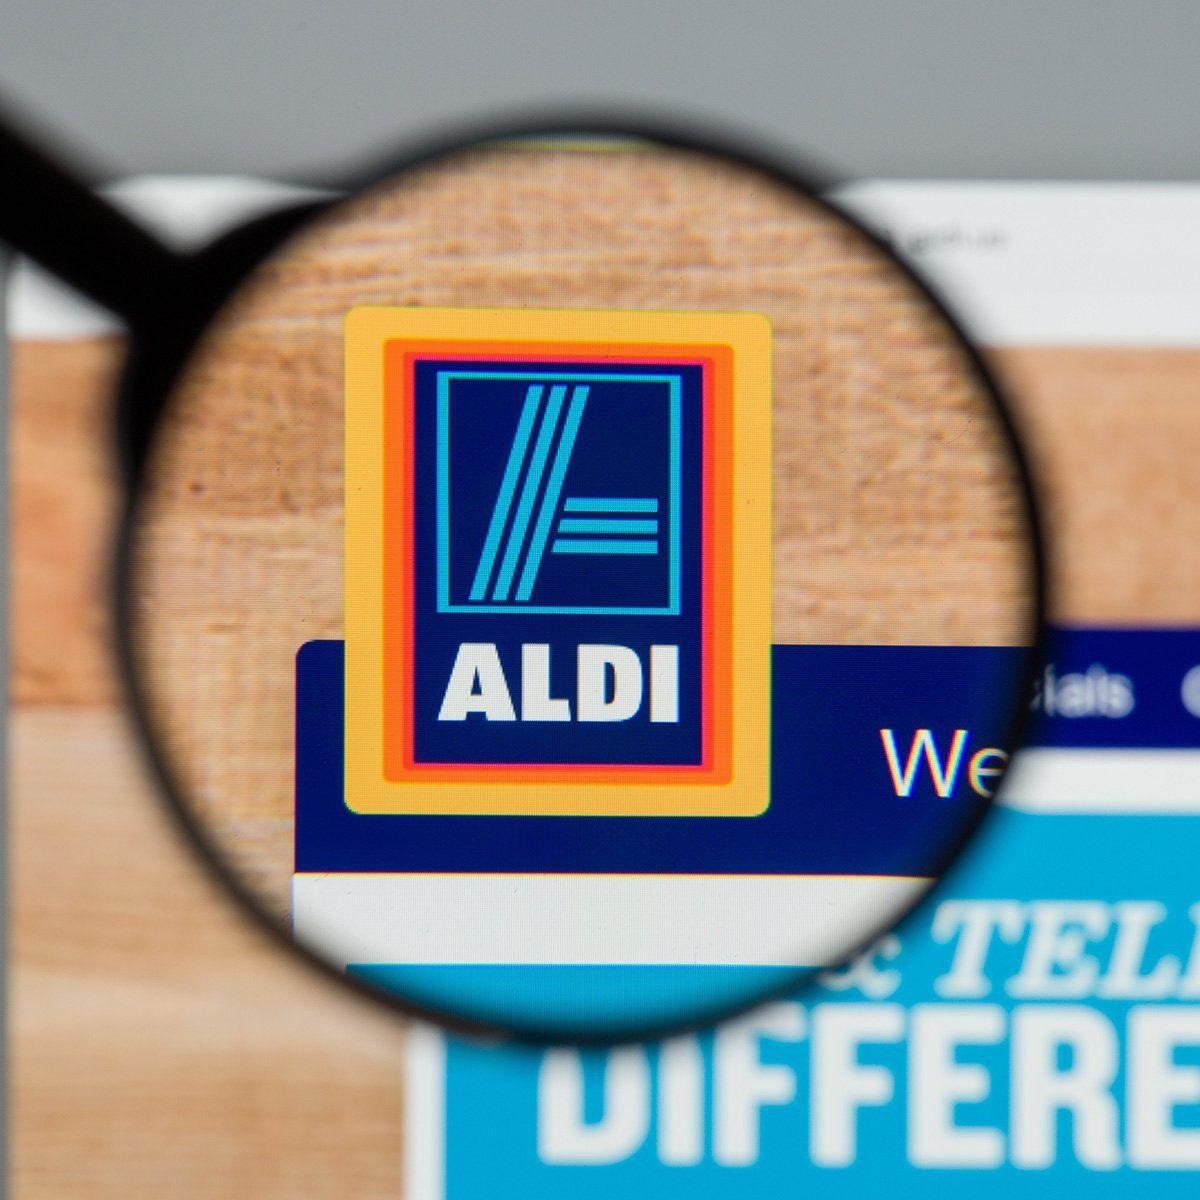 ALDI website homepage